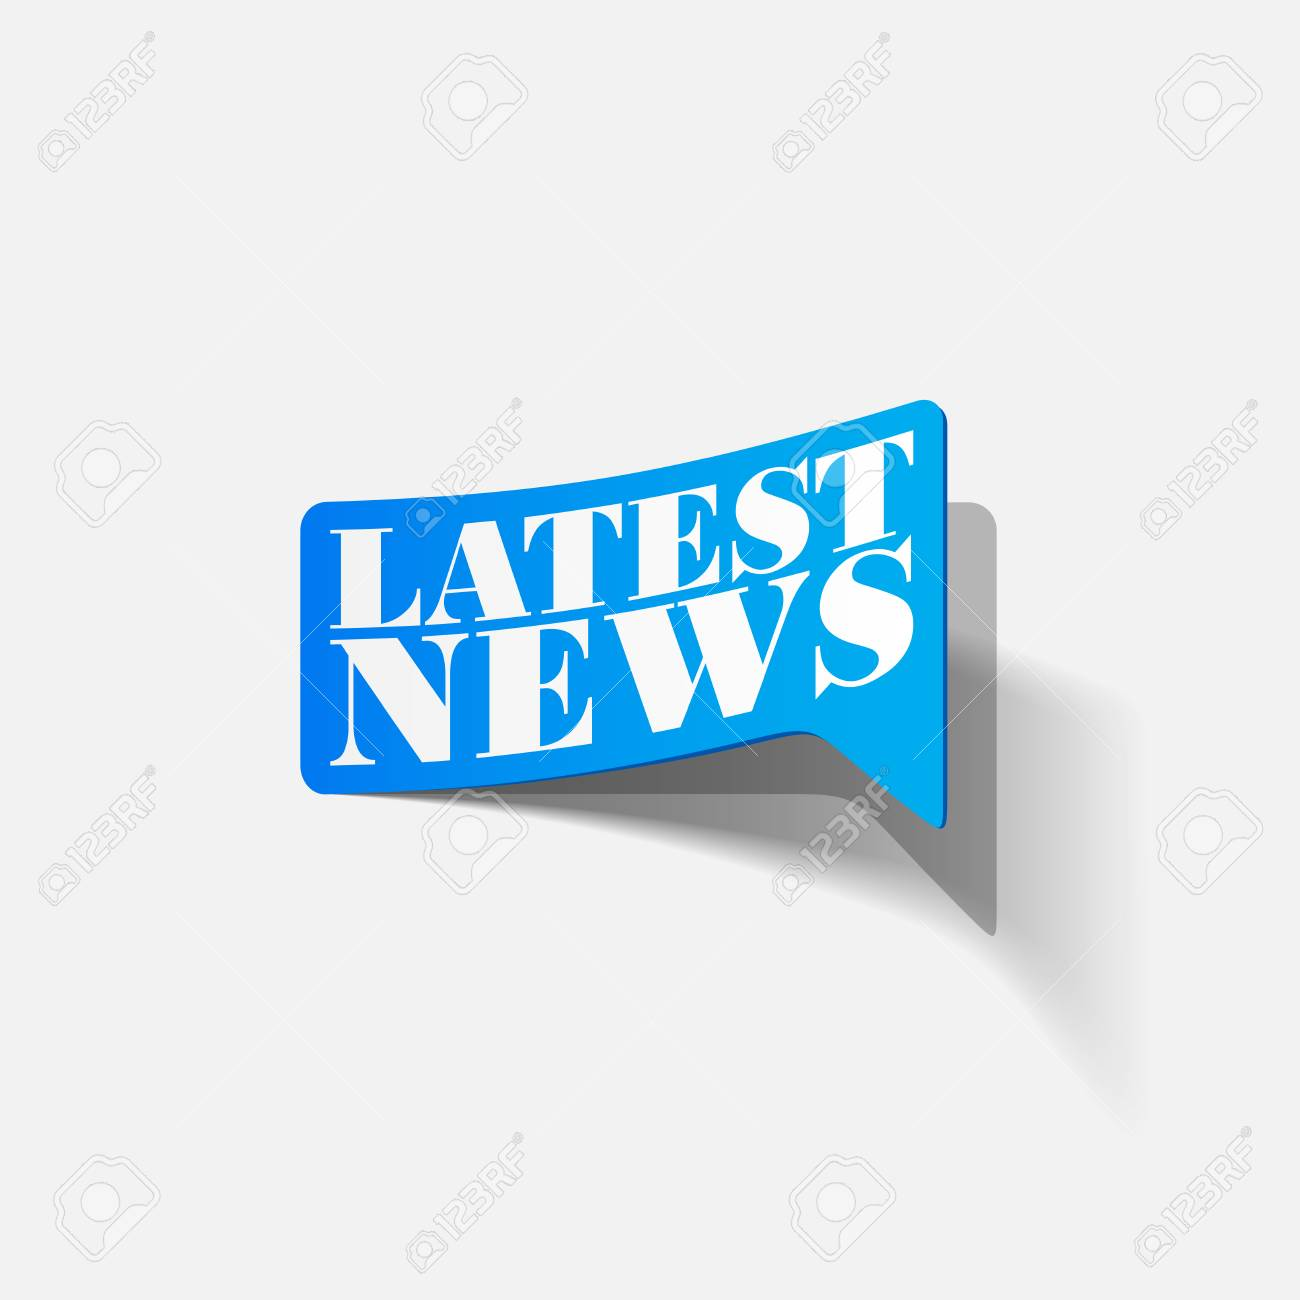 latest news, realistic sticker Stock Vector - 24004850